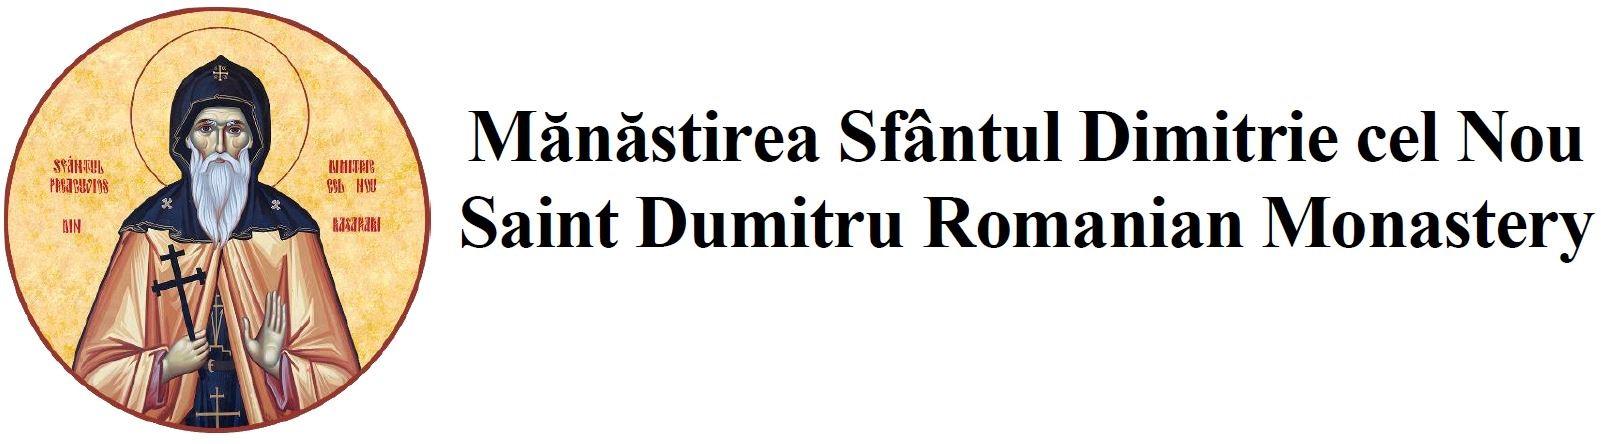 Saint Dumitru Romanian Orthodox Monastery